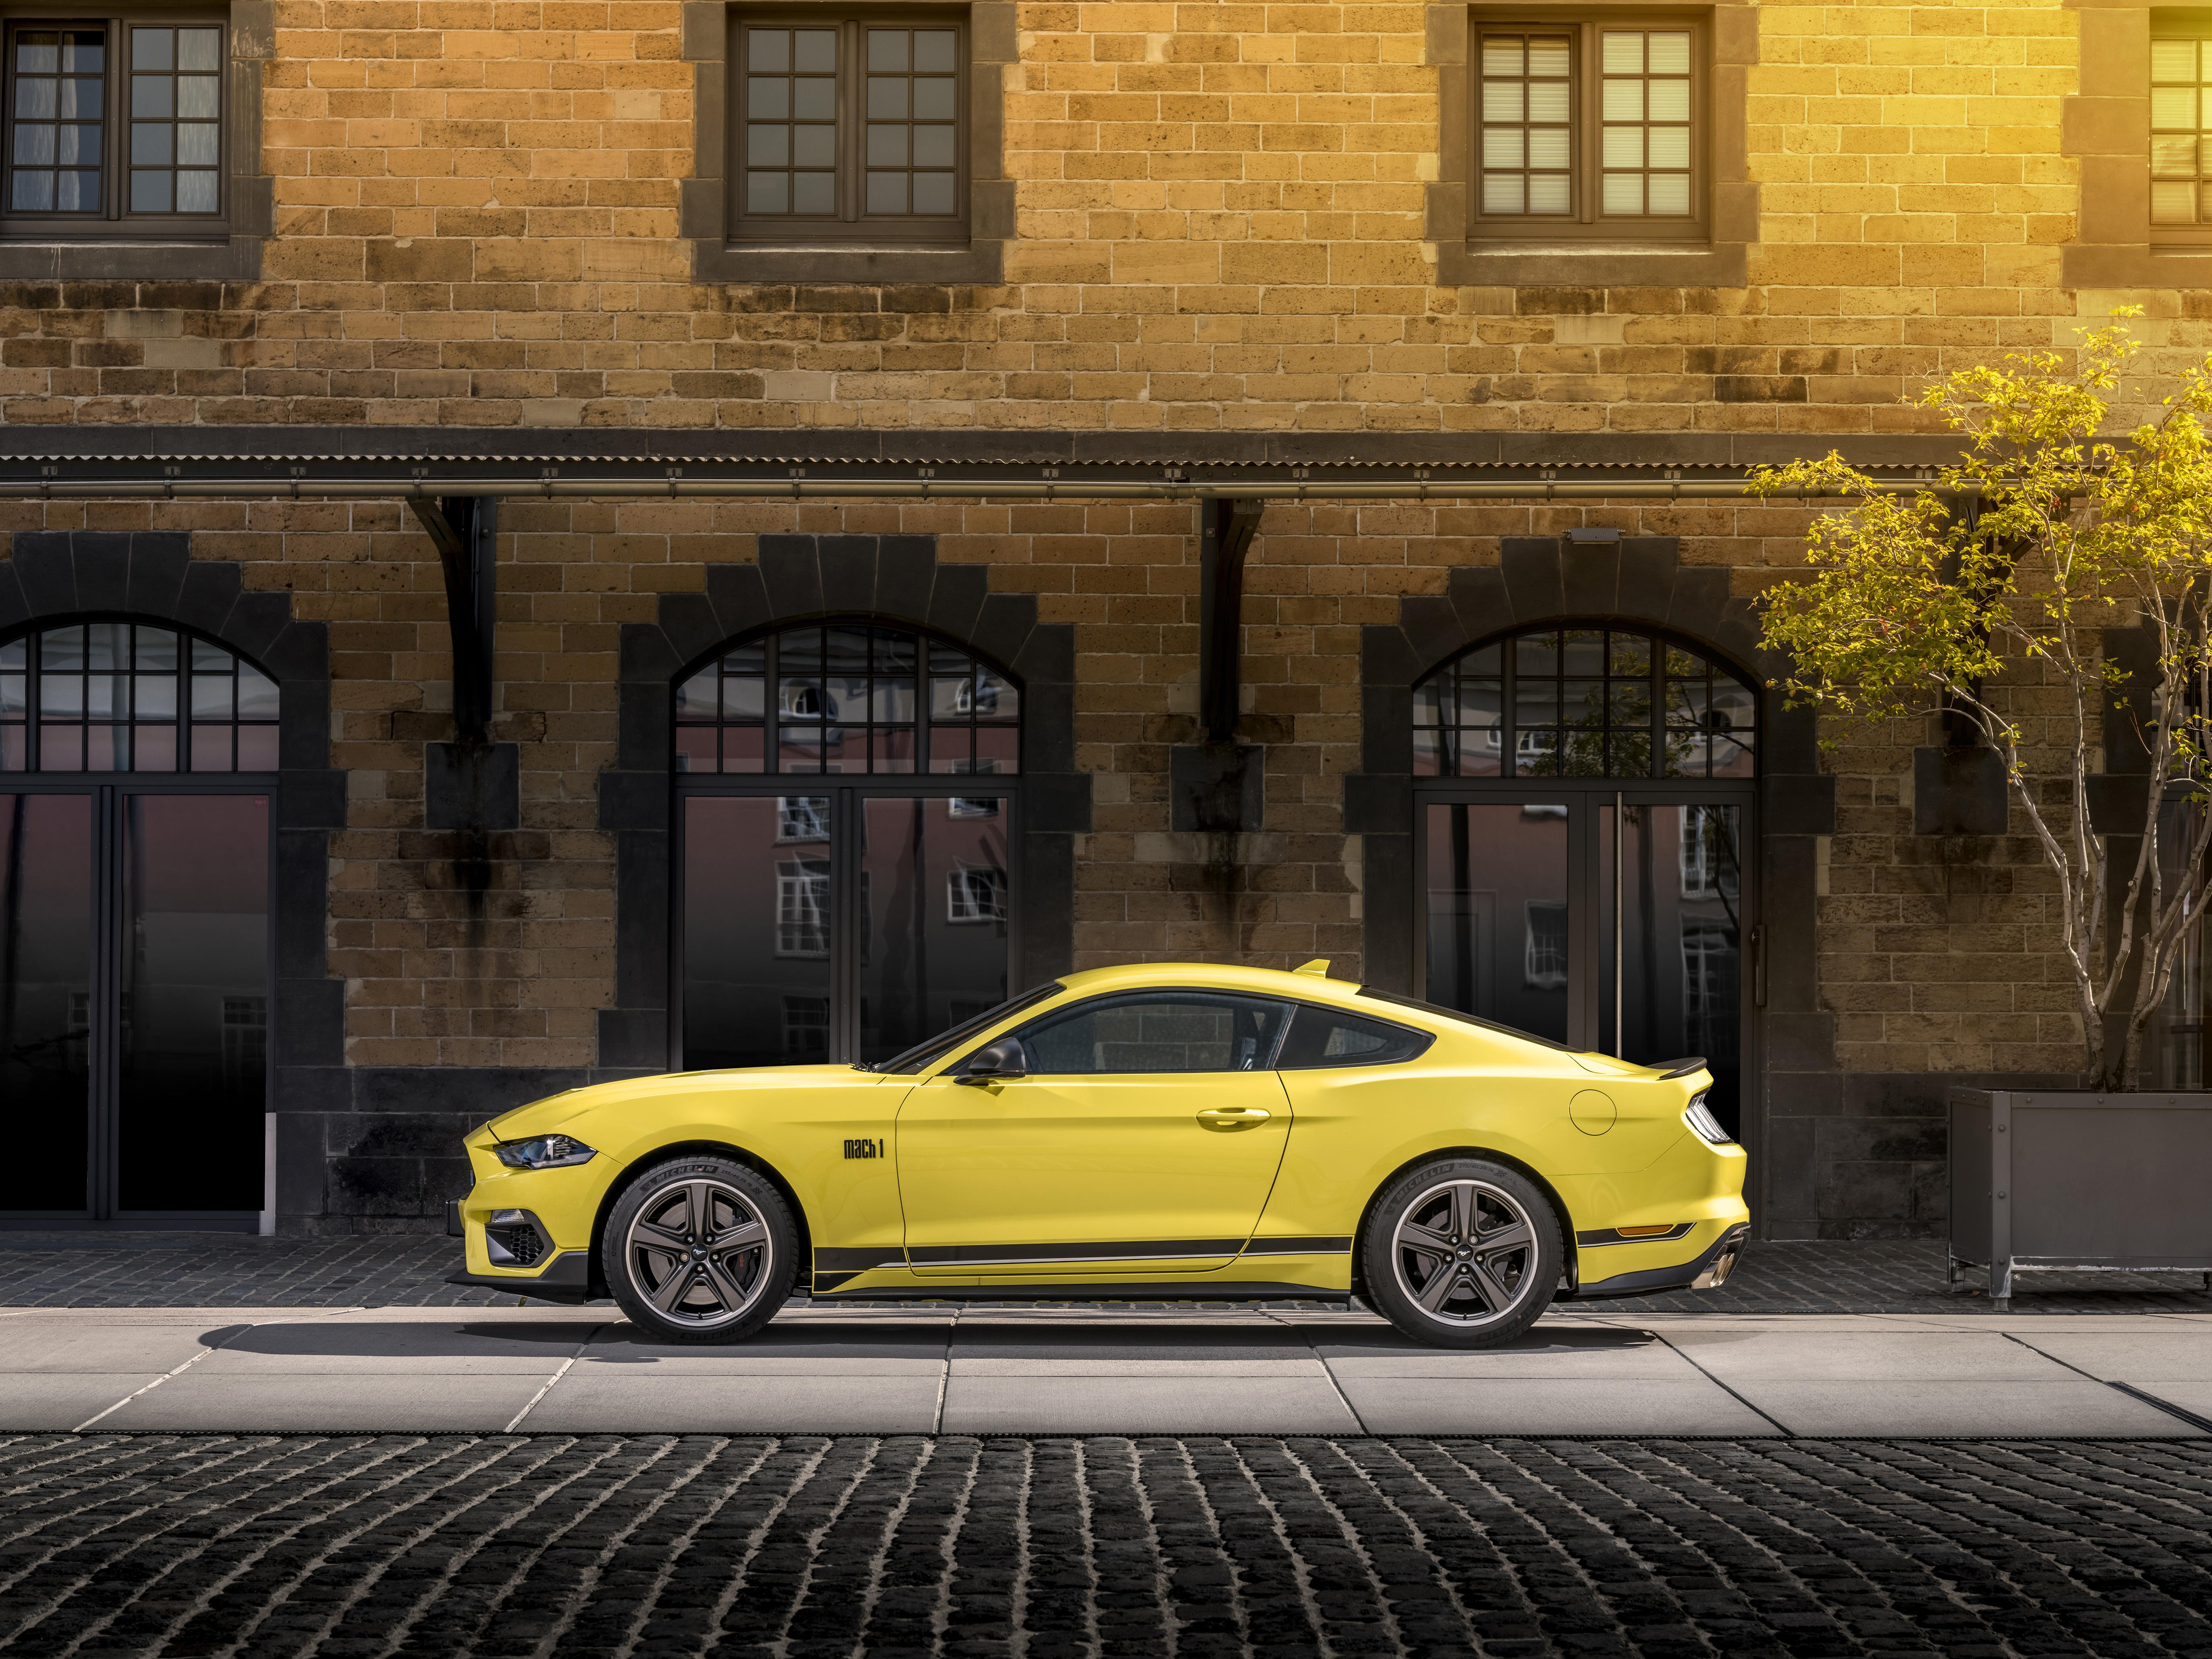 ford mustang 2021 4k 1608909404 - Ford Mustang 2021 4k - Ford Mustang 2021 4k wallpapers